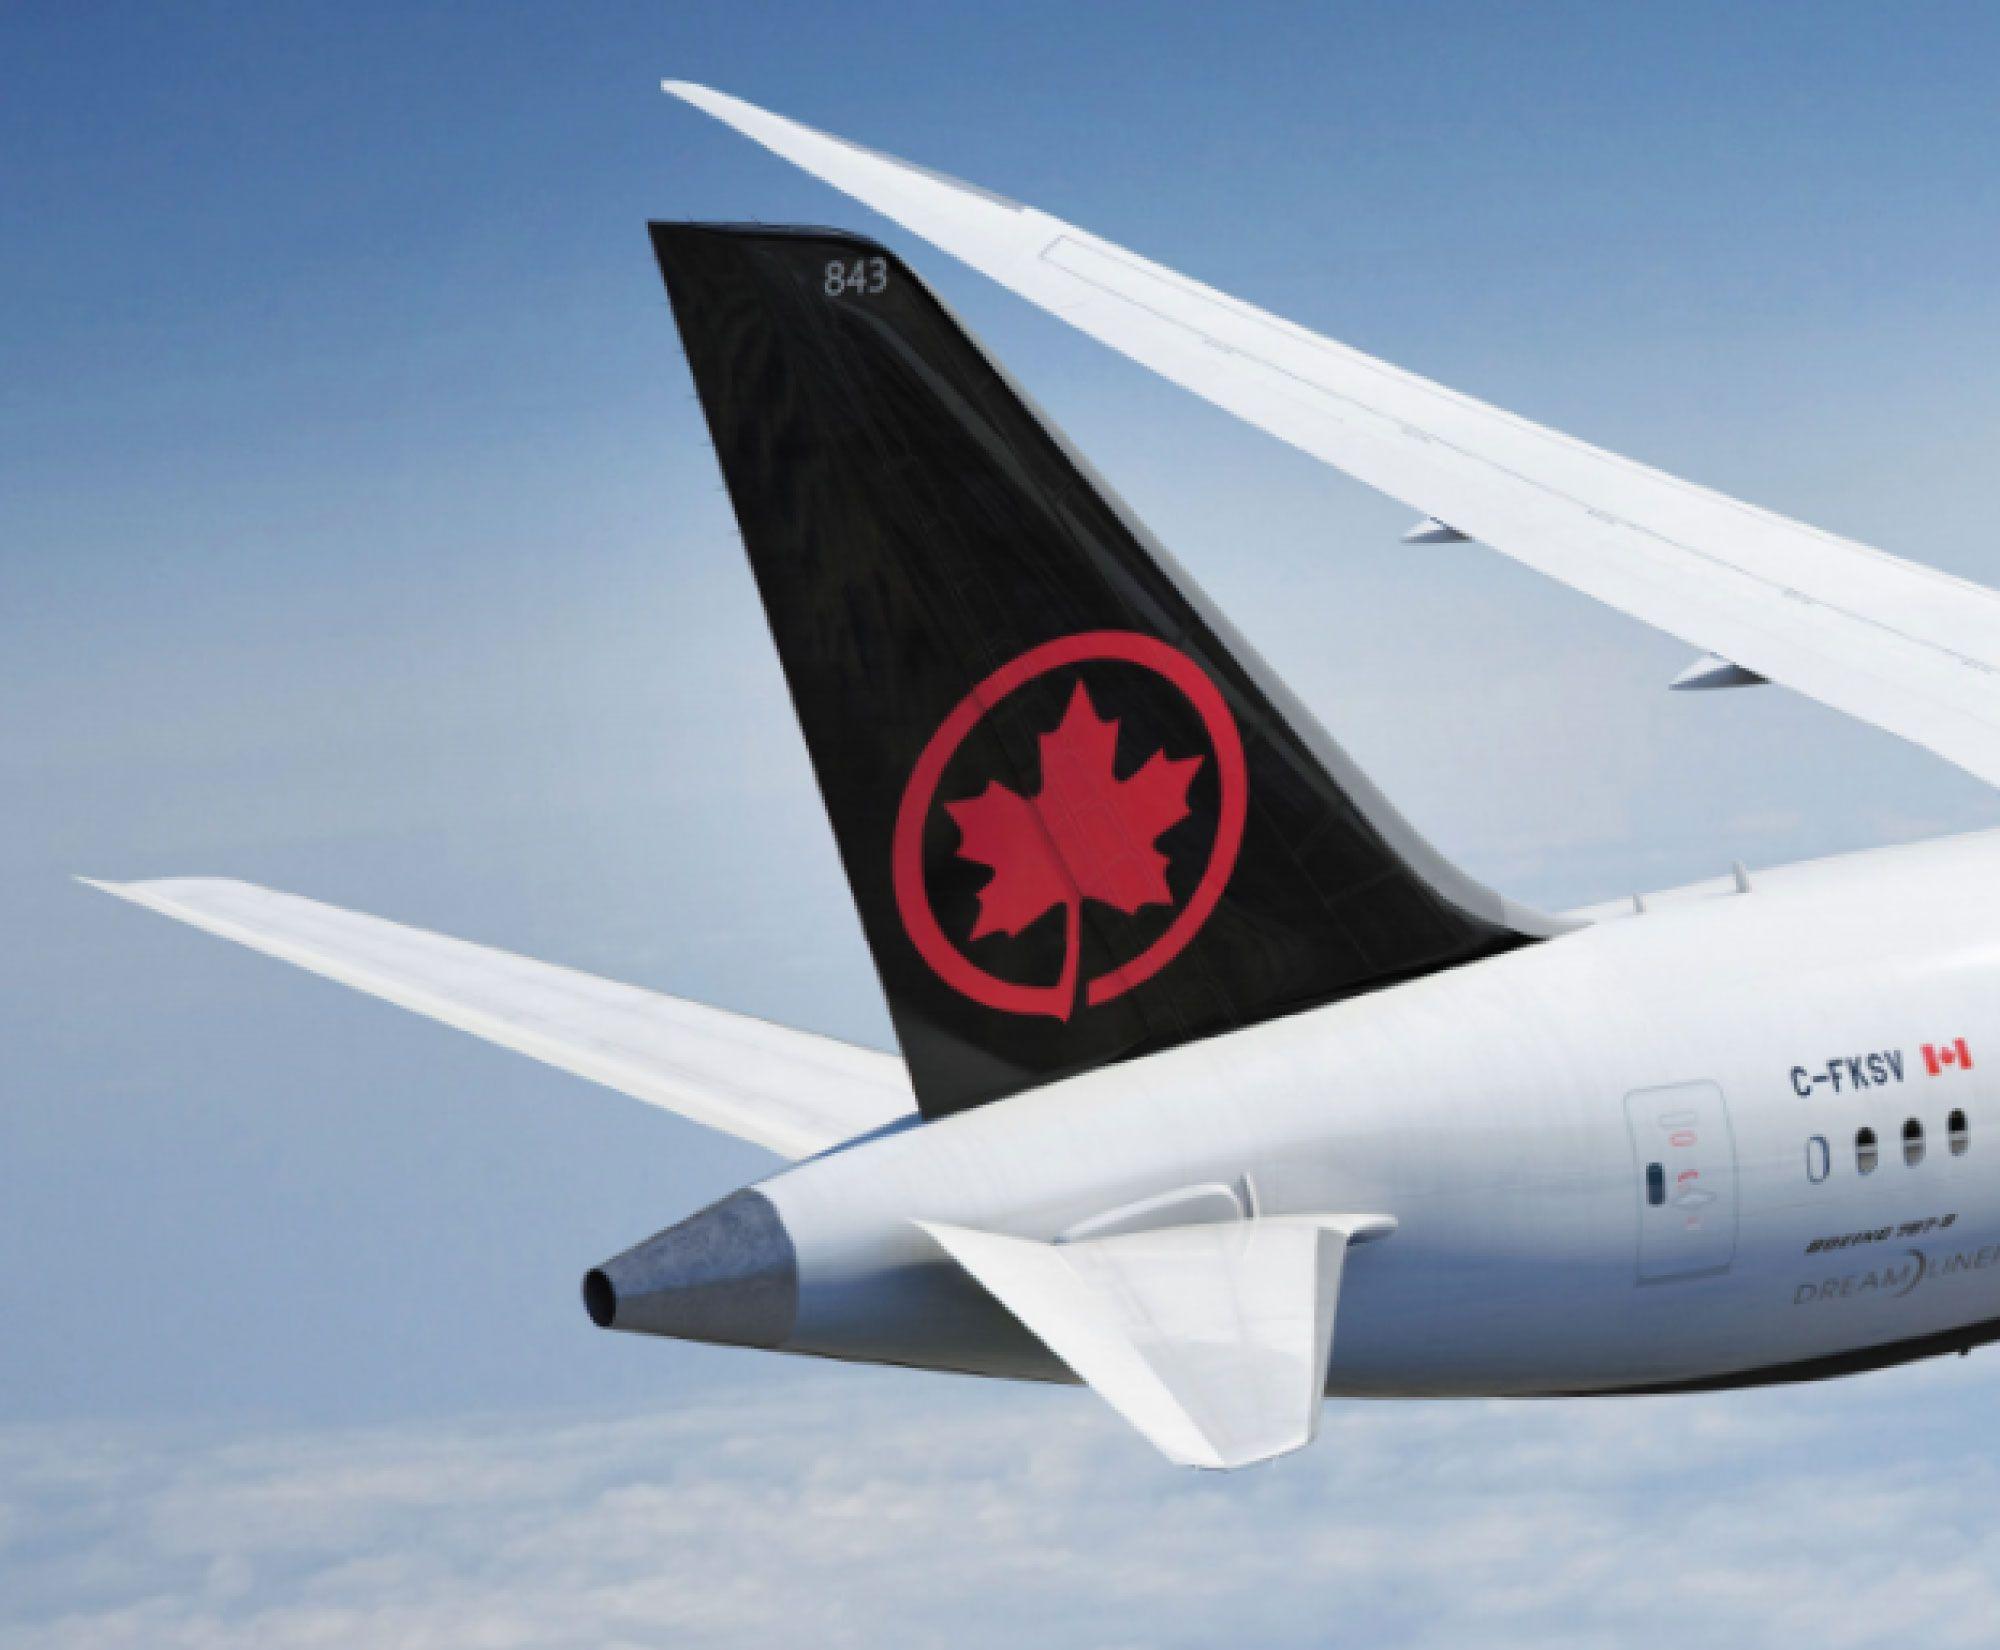 New Maple Leaf For Air Canada By Winkreative Via Logolounge Canada Air Canada History